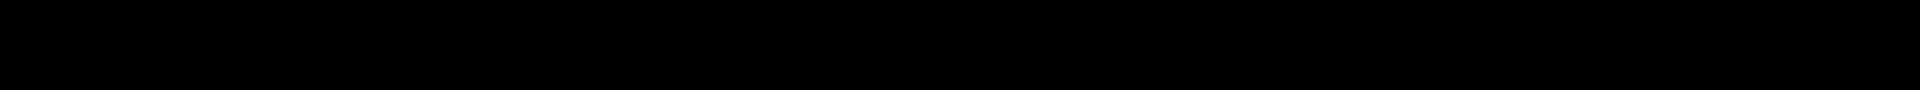 Télévision Issue2